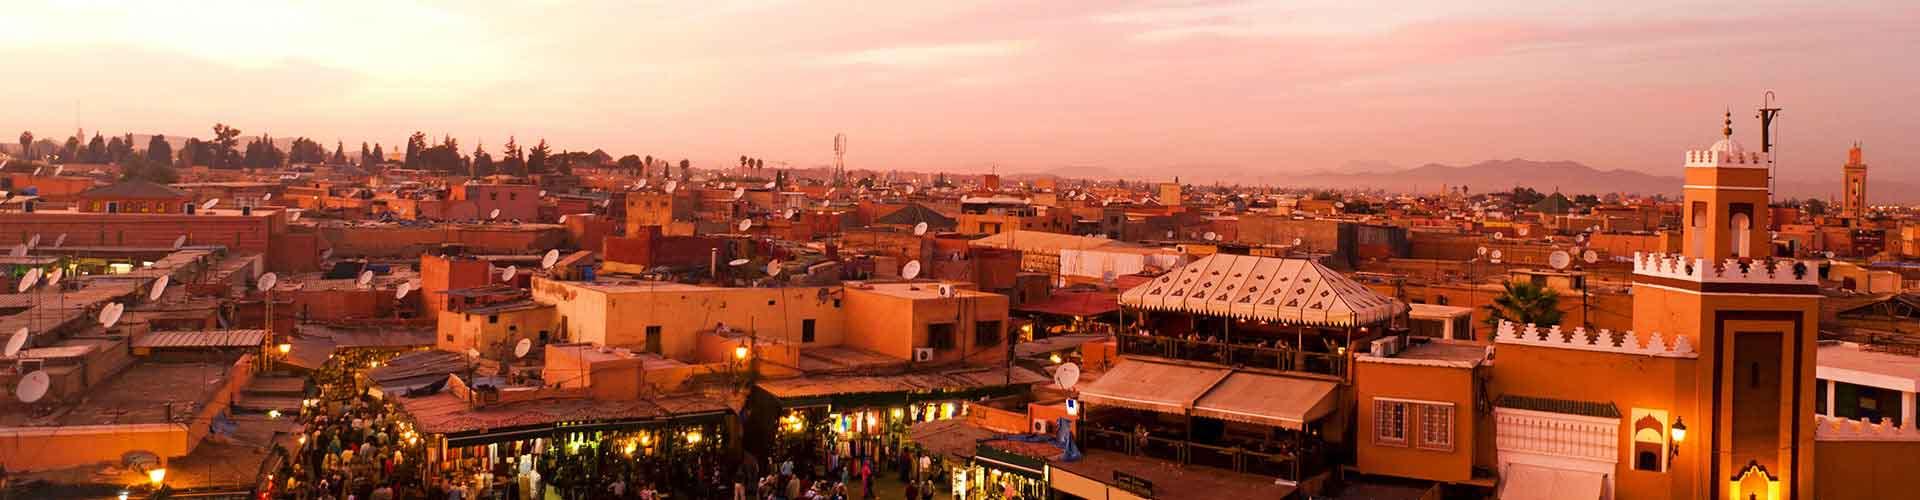 Marrakech - Campamentos en Marrakech. Mapas de Marrakech, Fotos y comentarios de cada Campamento en Marrakech.